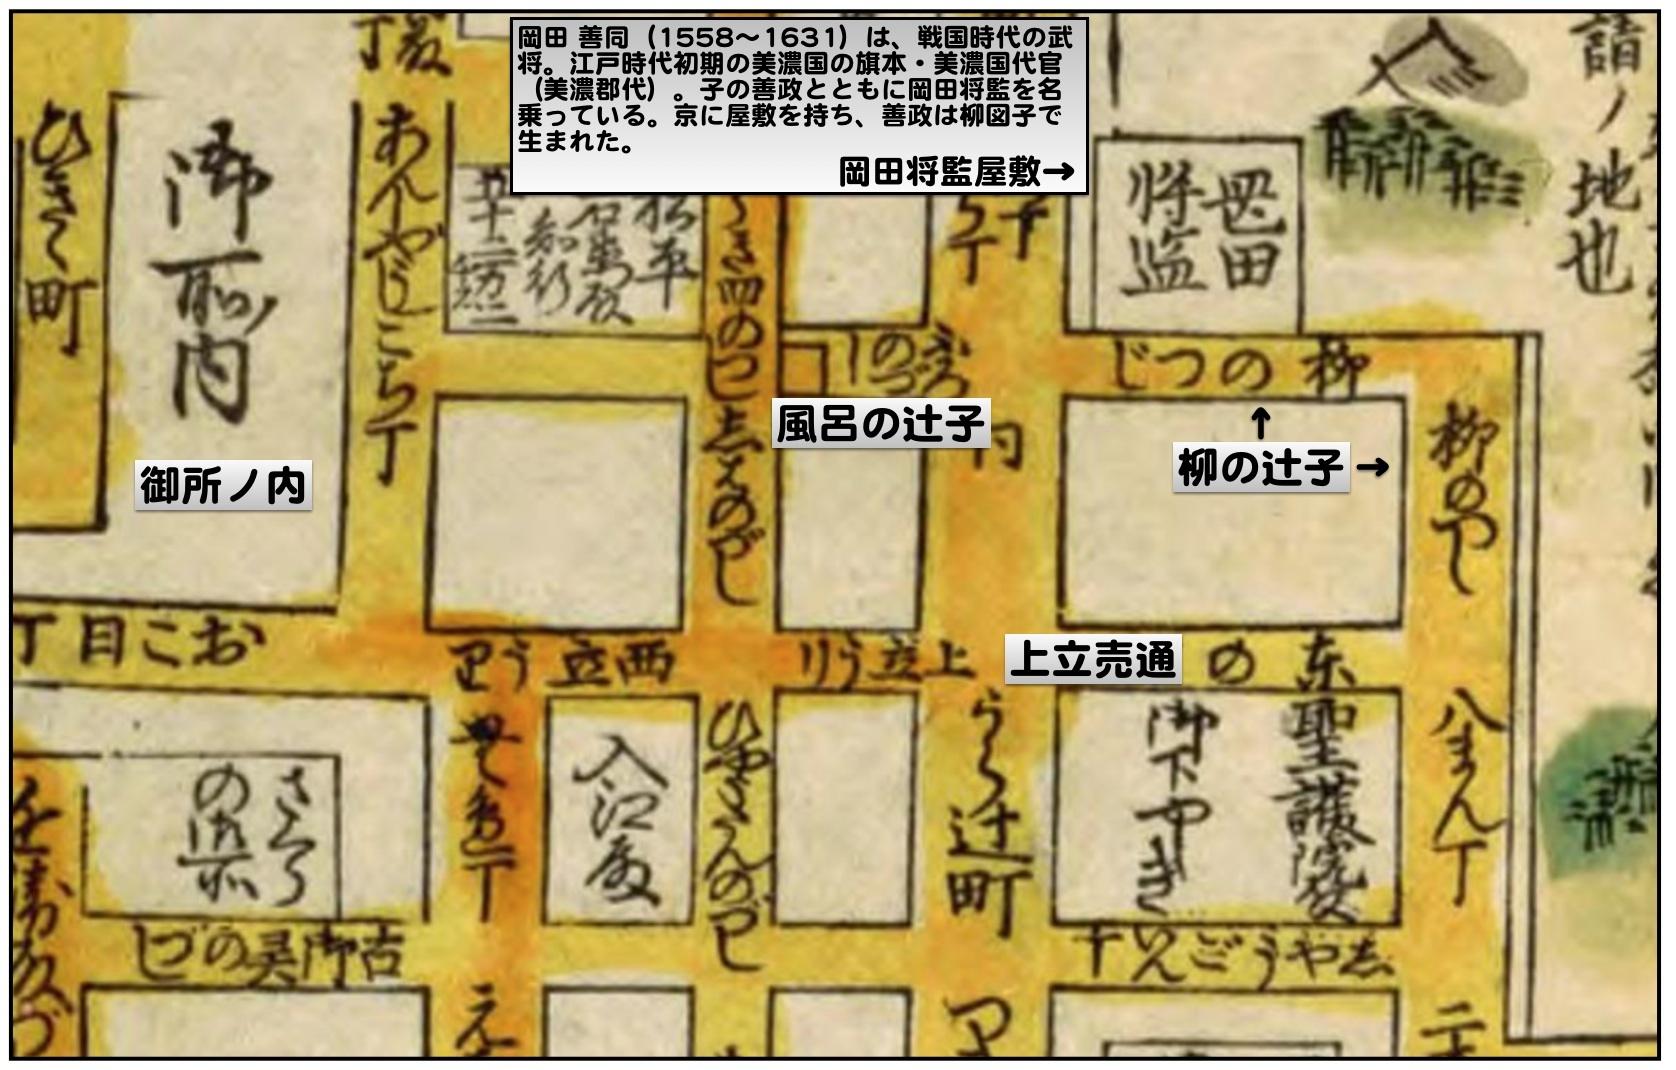 1柳の辻子・新撰増補京大絵図